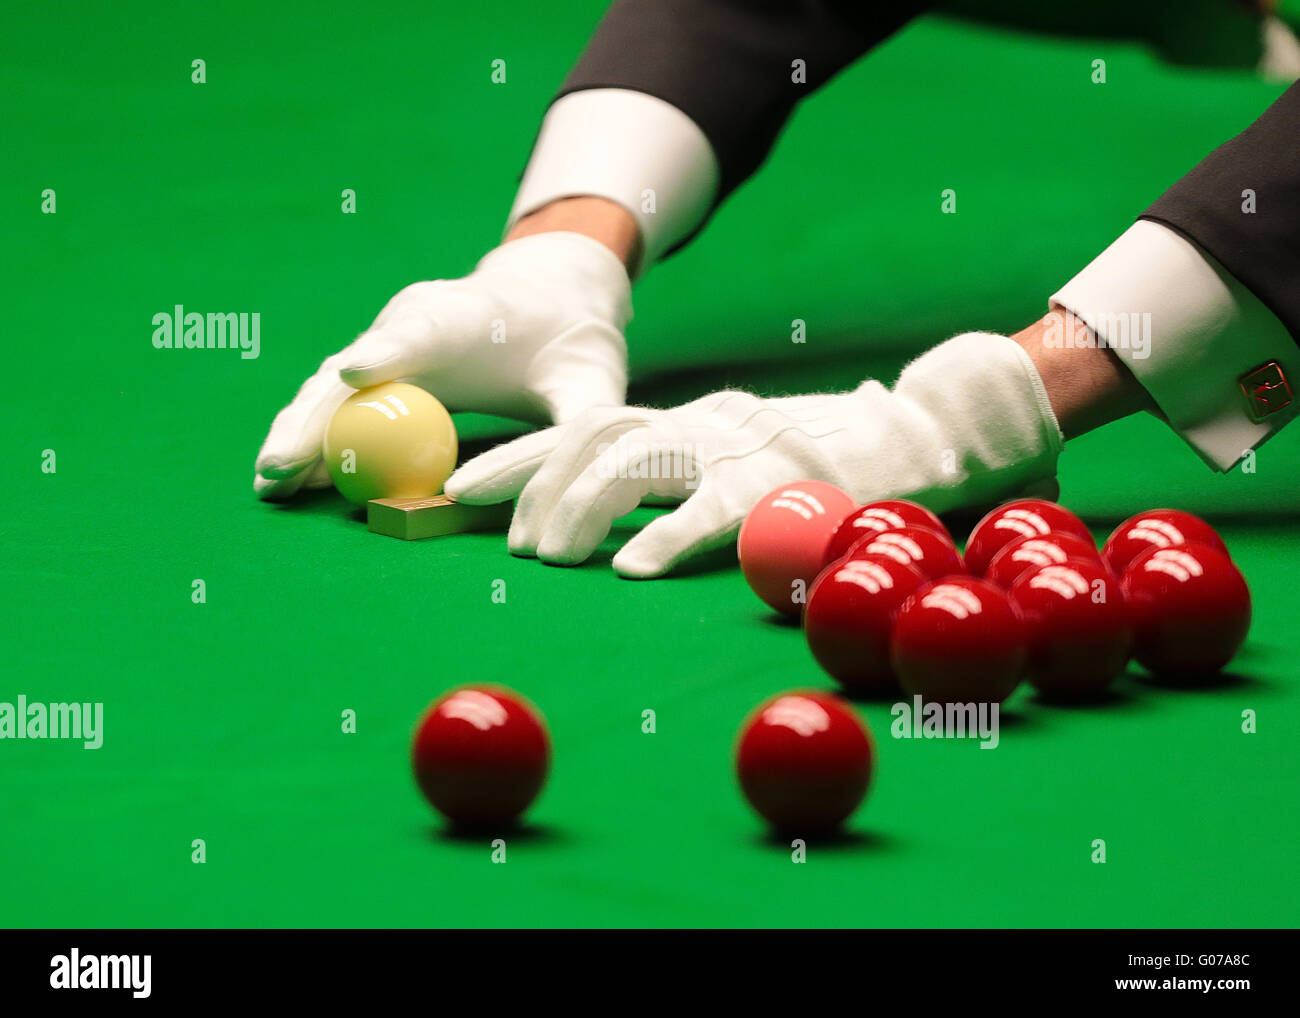 Der Tiegel, Sheffield, UK. 30. April 2016. World Snooker Championship. Halbfinale, Ding Junhui gegen Alan McManus. Stockbild